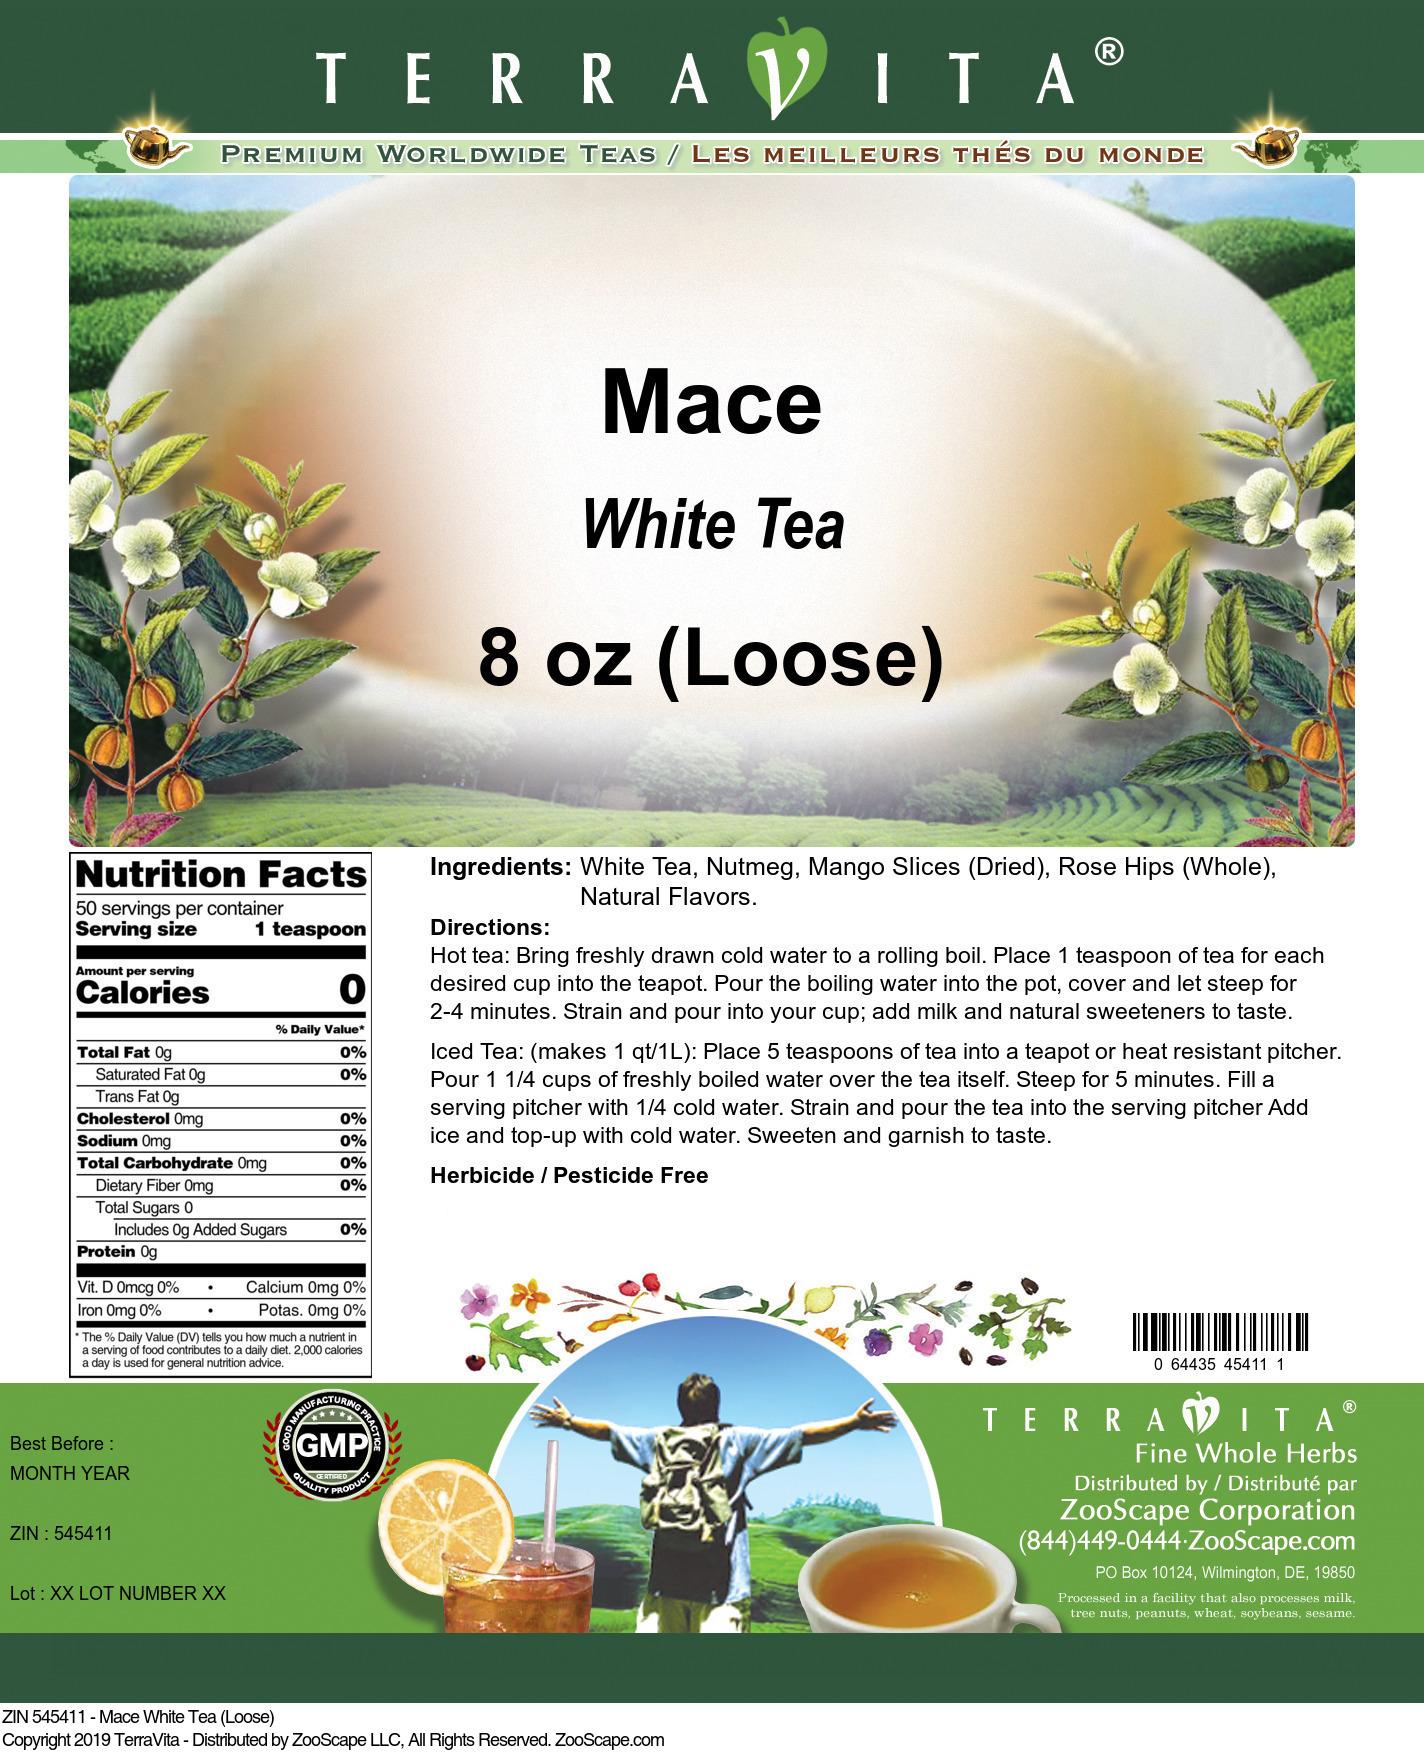 Mace White Tea (Loose)